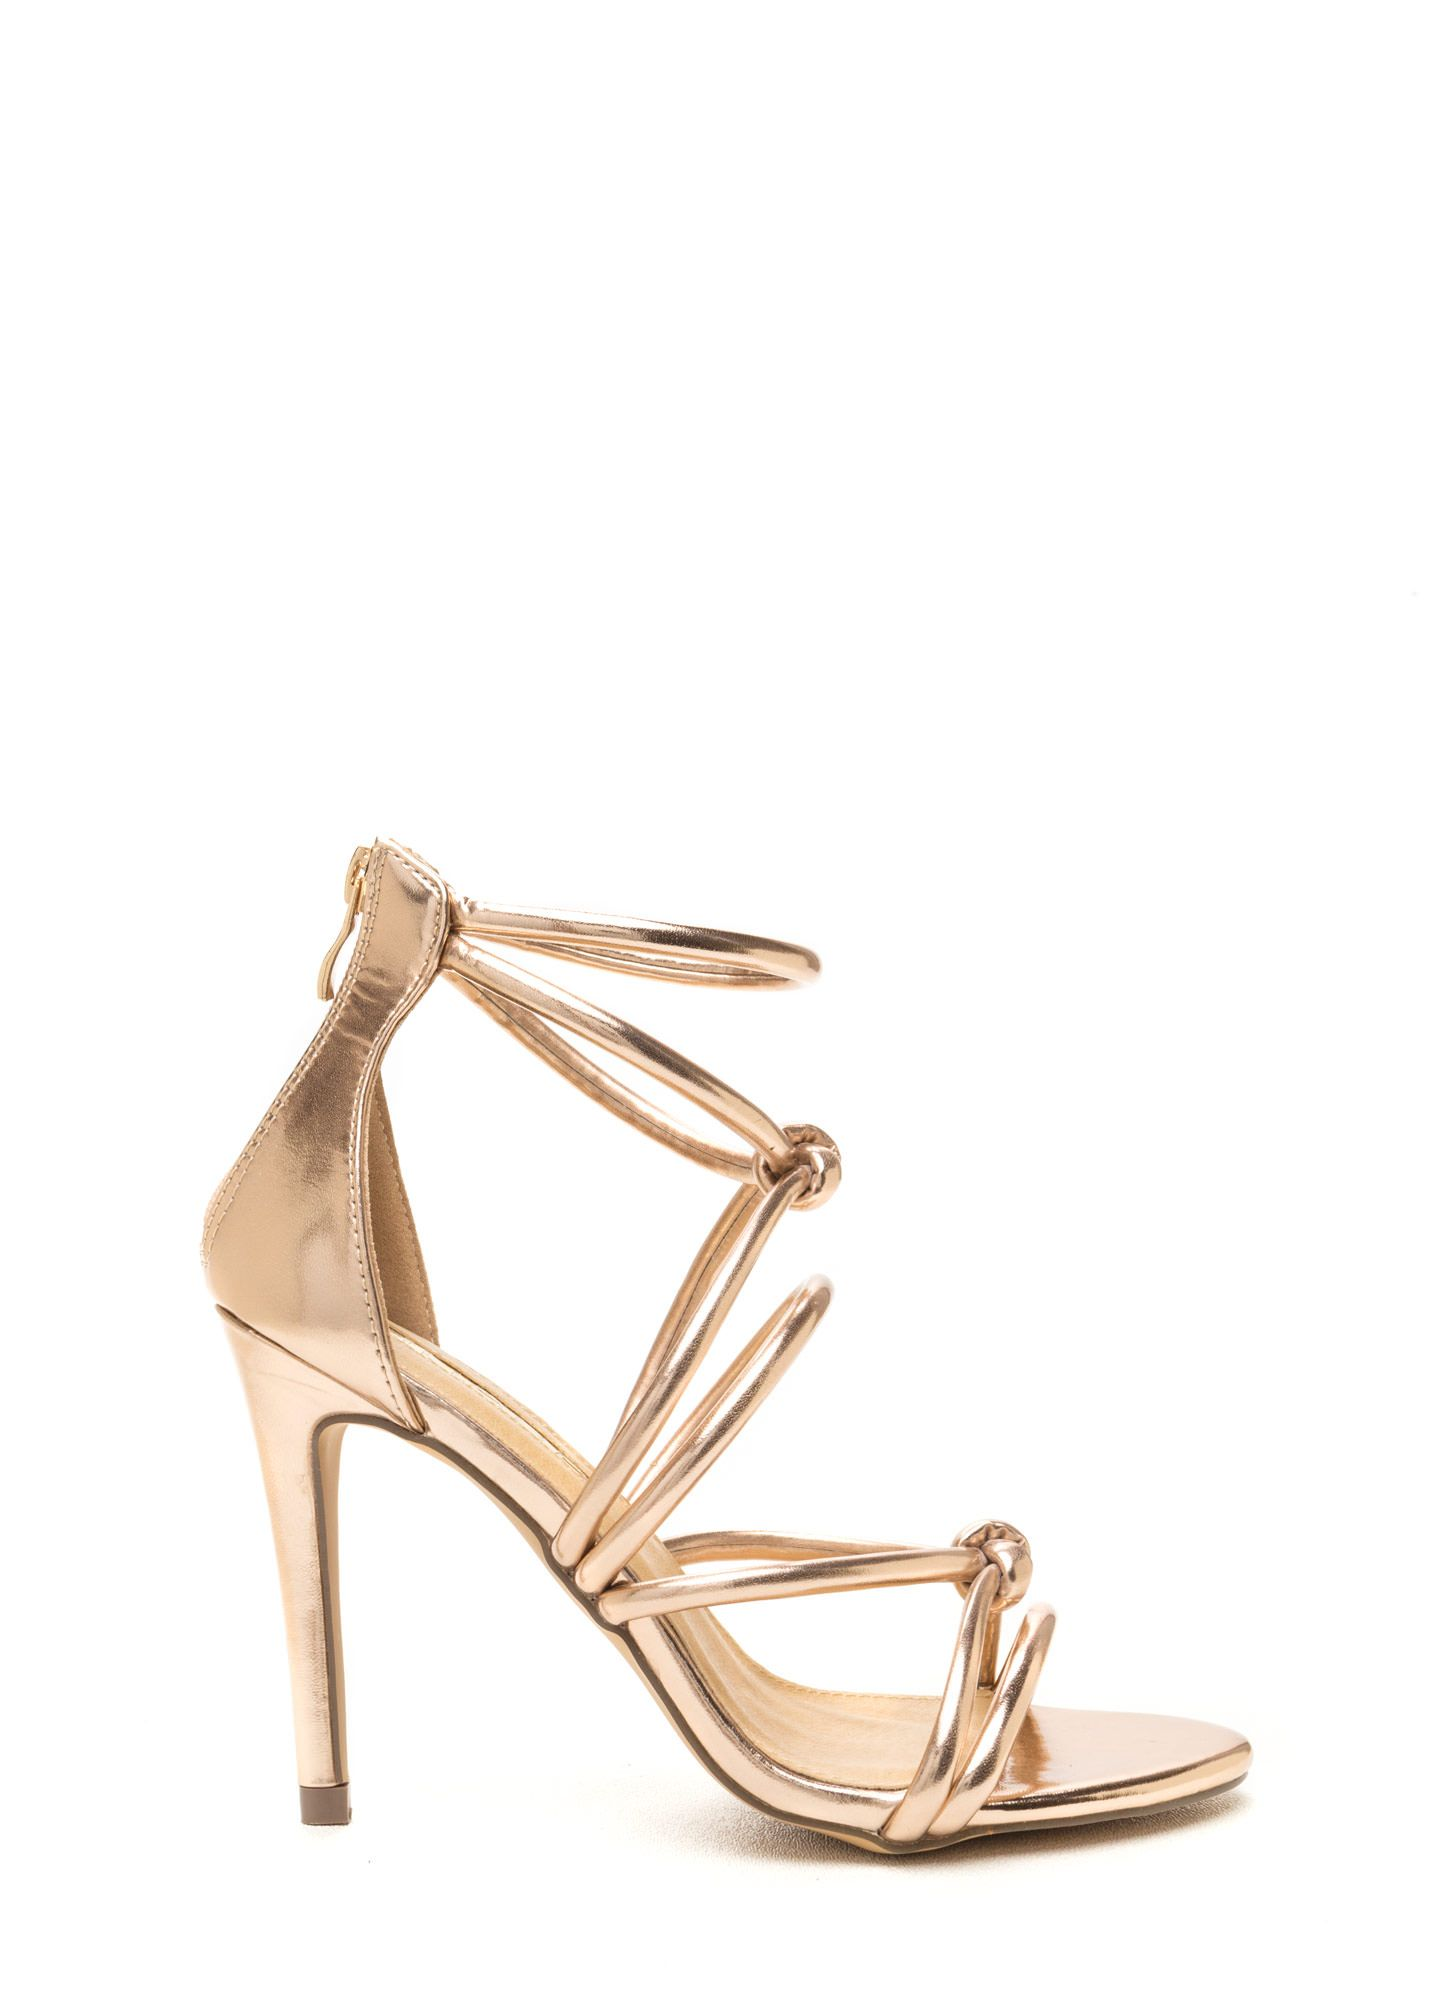 7adf1d37045 Runway Waltz Strappy Metallic Heels CHAMPAGNE